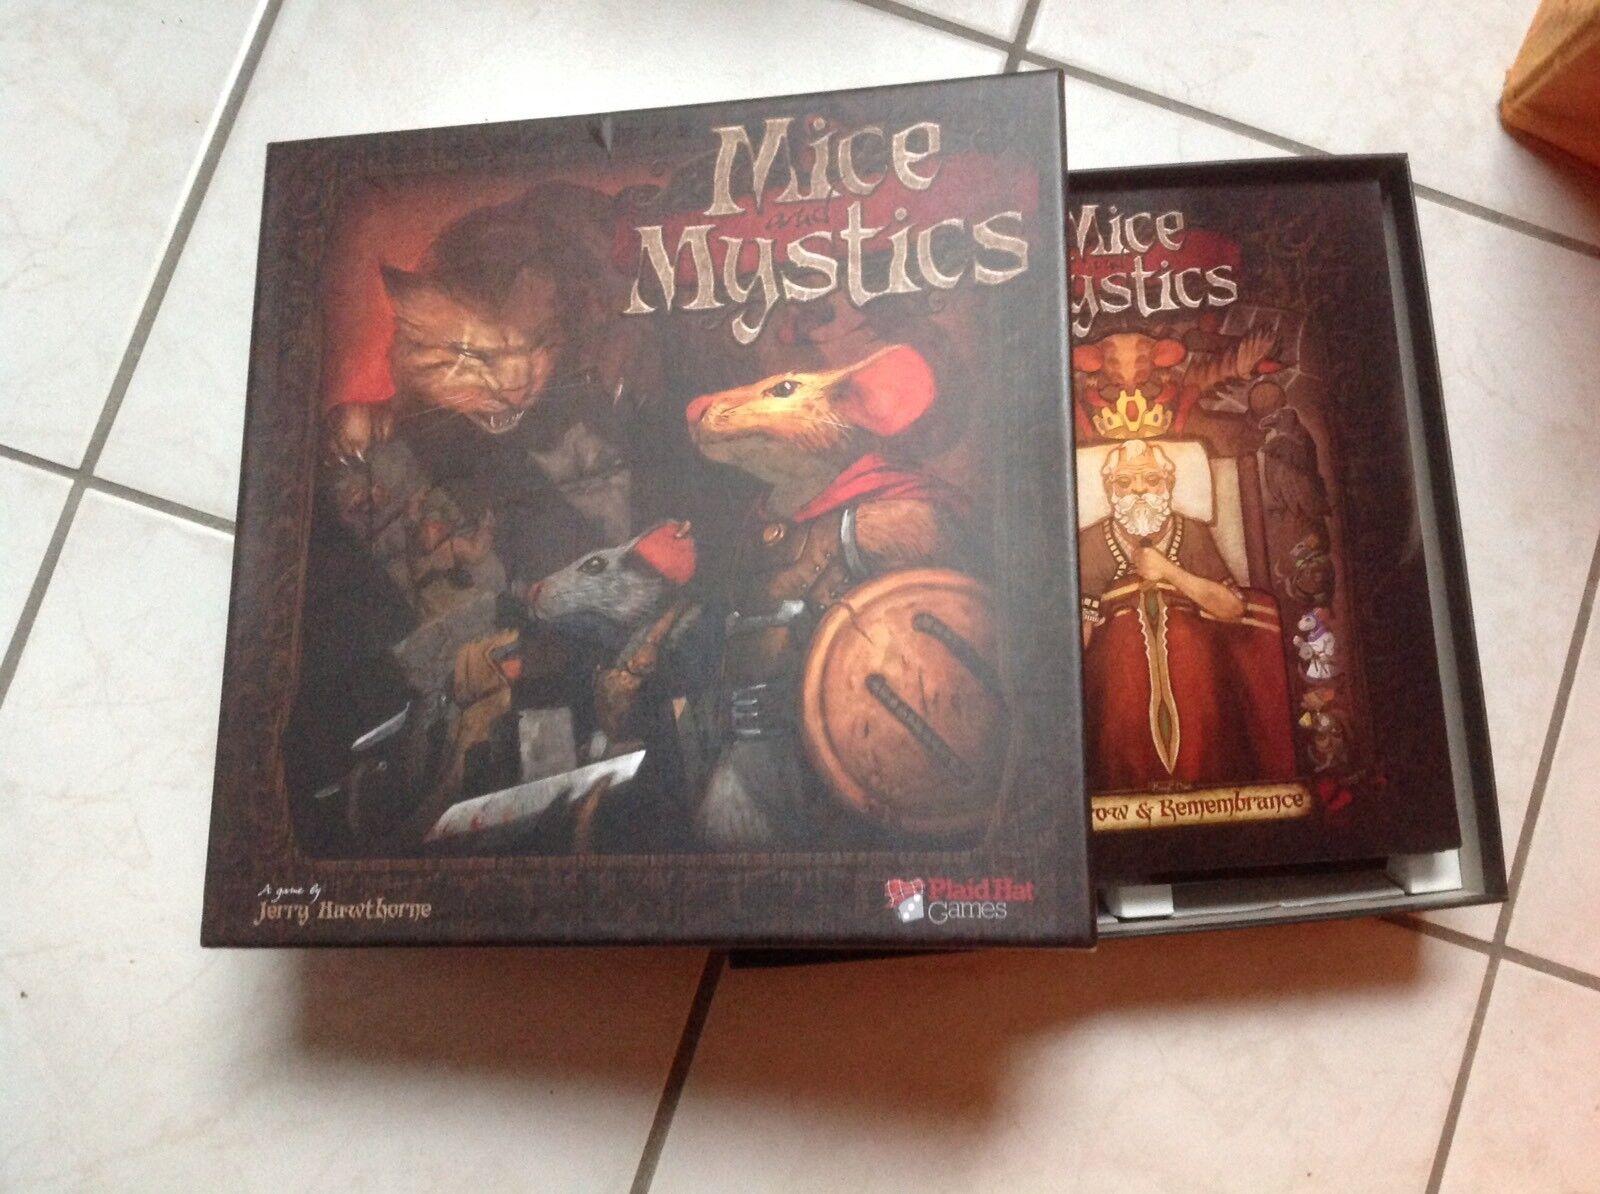 Mice e mystics inglese  Version Plaidhat  100% autentico